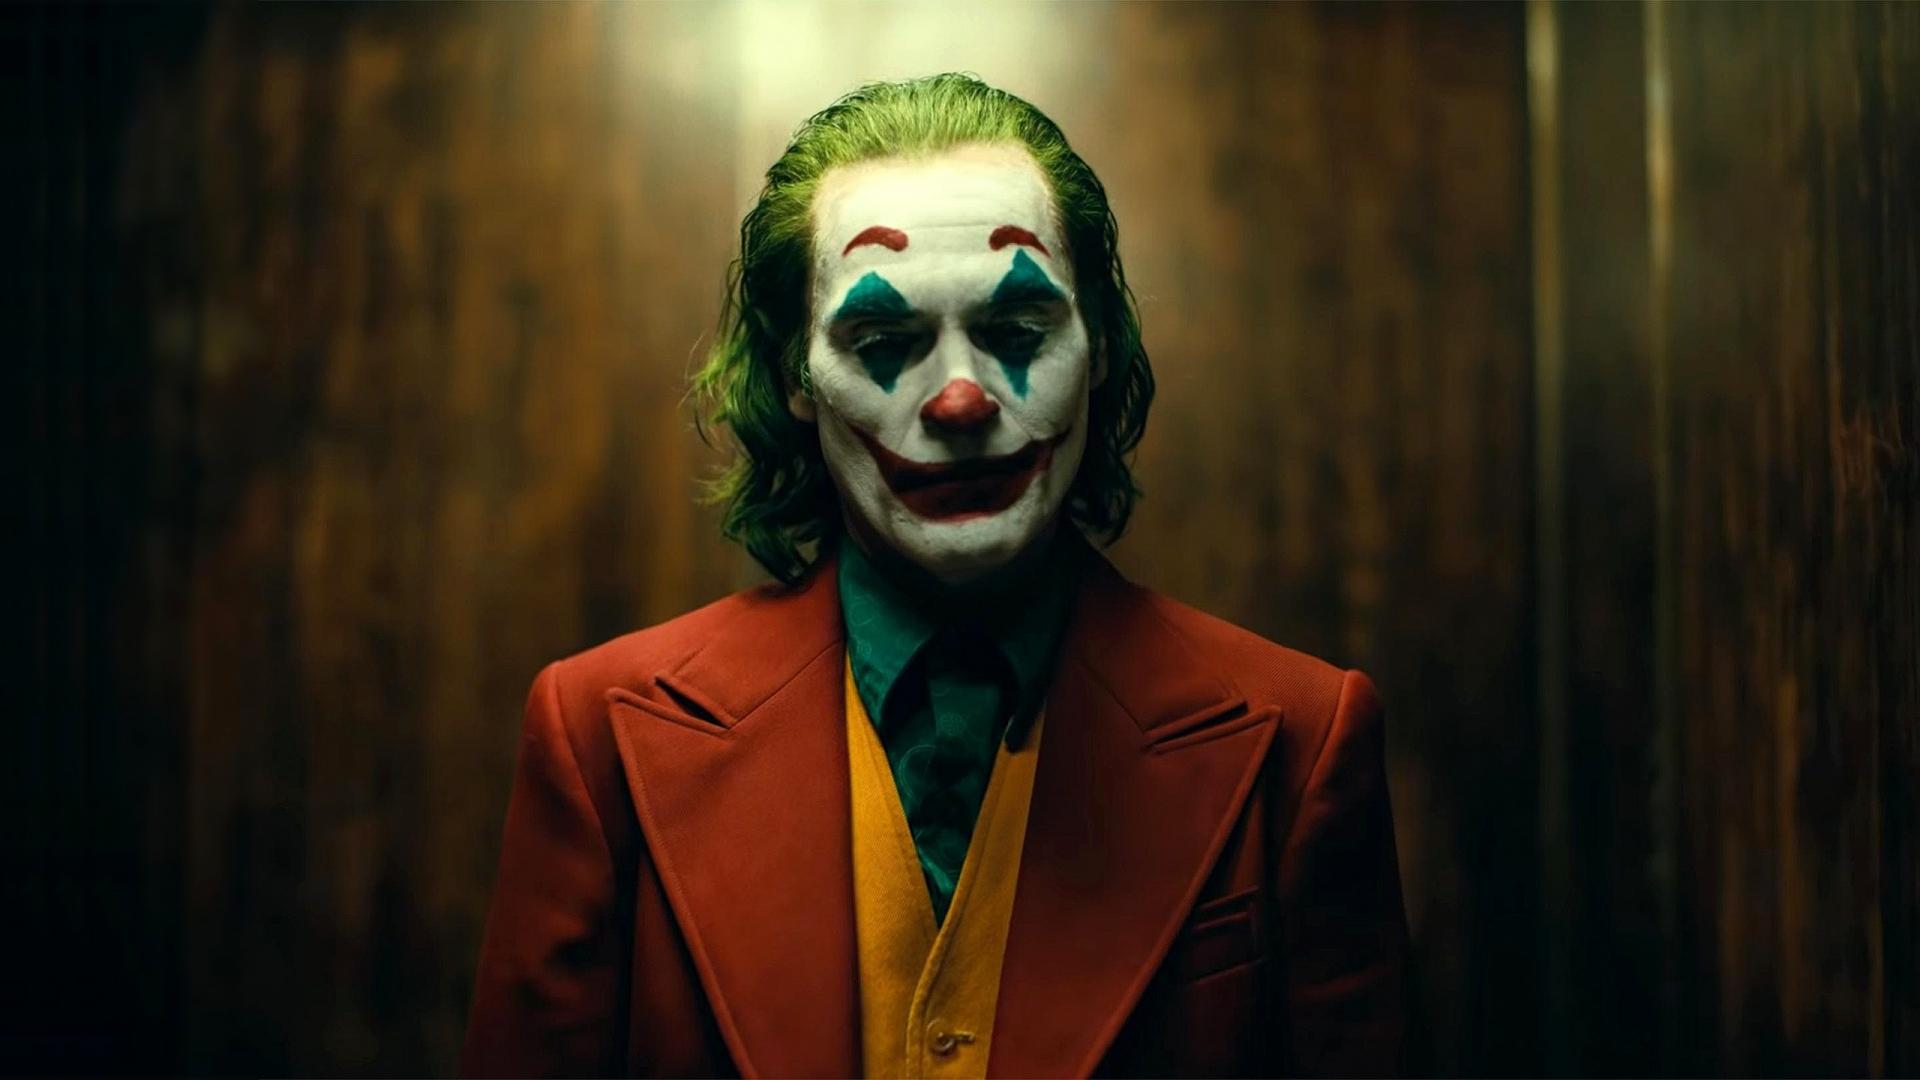 Download 1920x1080 Wallpaper Joker Joaquin Phoenix 2019 Movie Full Hd Hdtv Fhd 1080p 1920x1080 Hd Image Background 20869